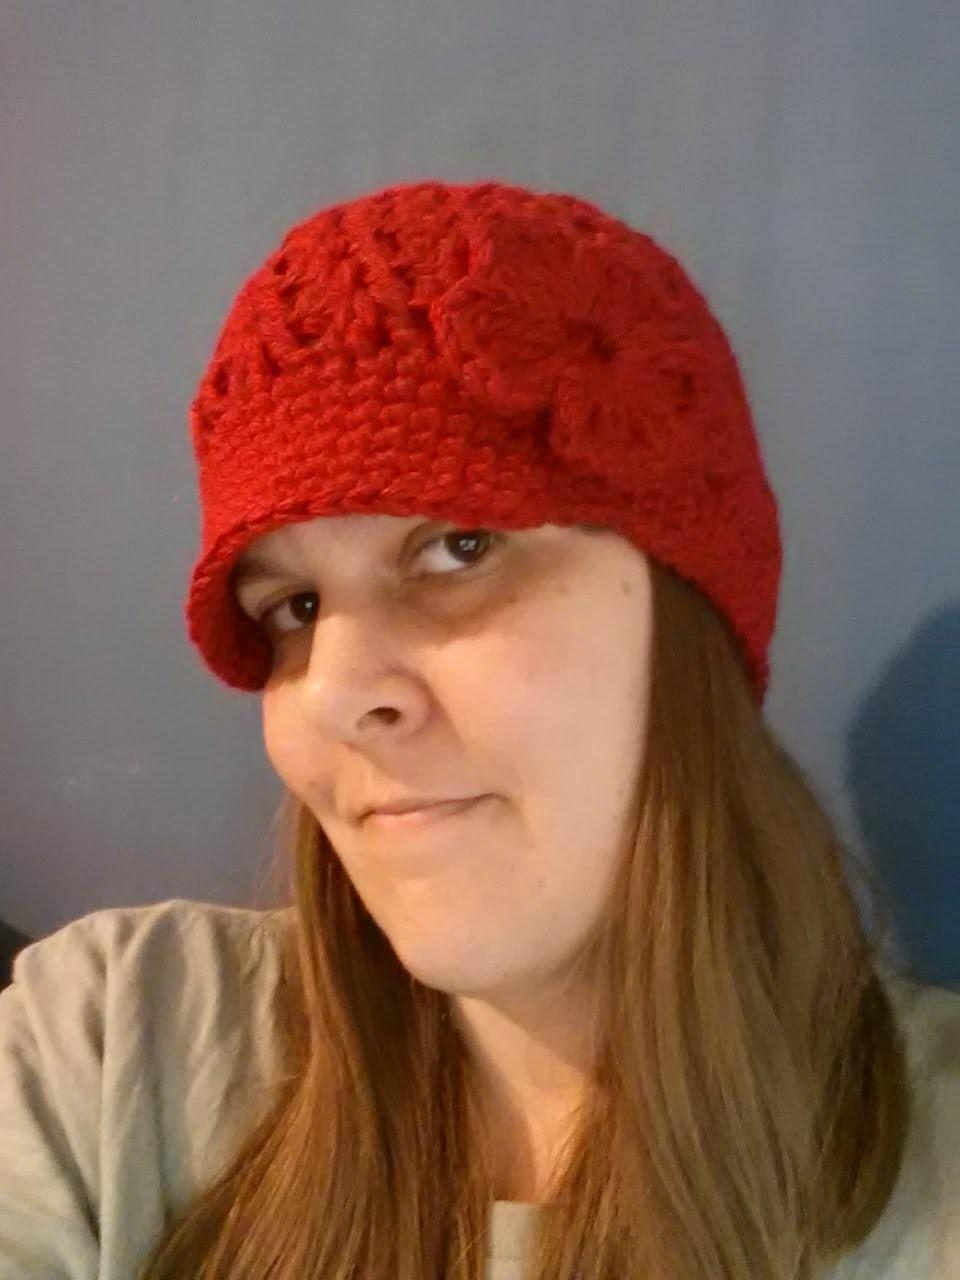 DIY #Crochet Adult Newsboy Cap Hat #Tutorial How to Crochet